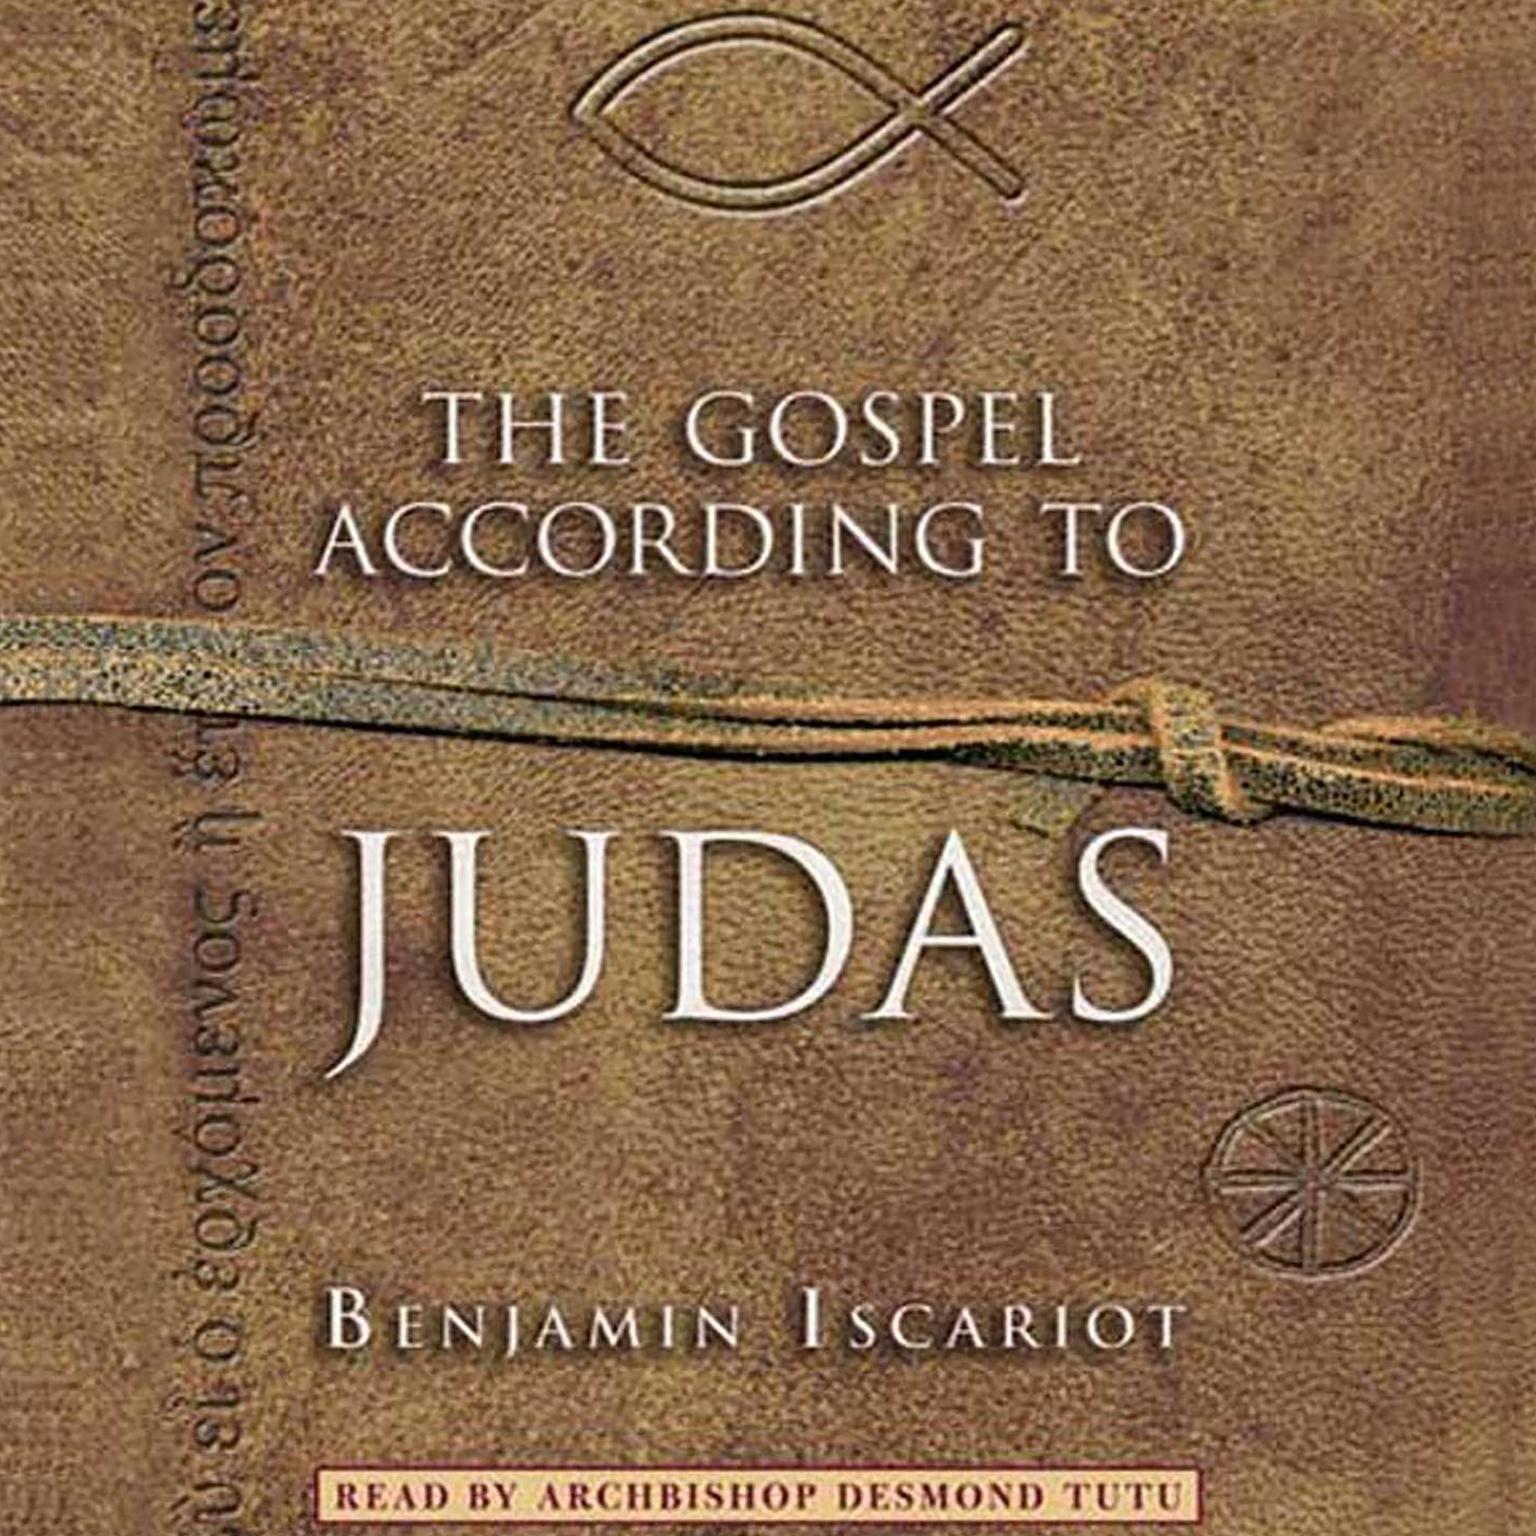 Printable The Gospel According to Judas by Benjamin Iscariot Audiobook Cover Art